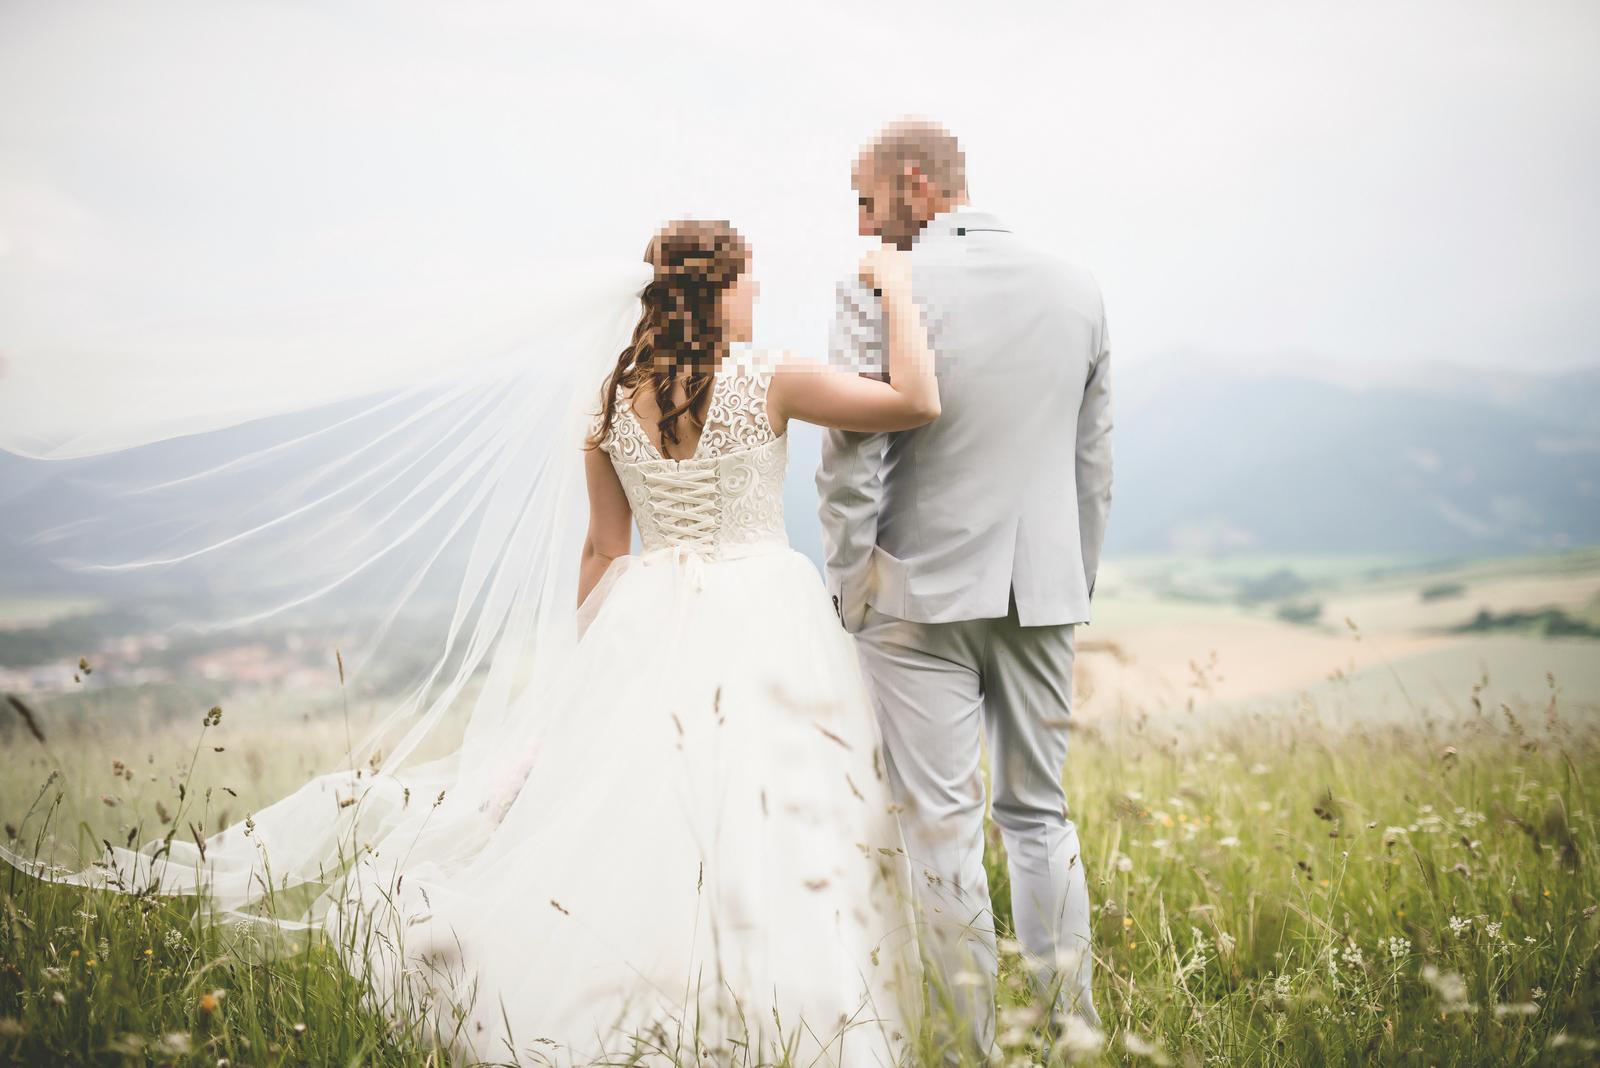 Jednoduché smotanové svadobné šaty - Obrázok č. 4